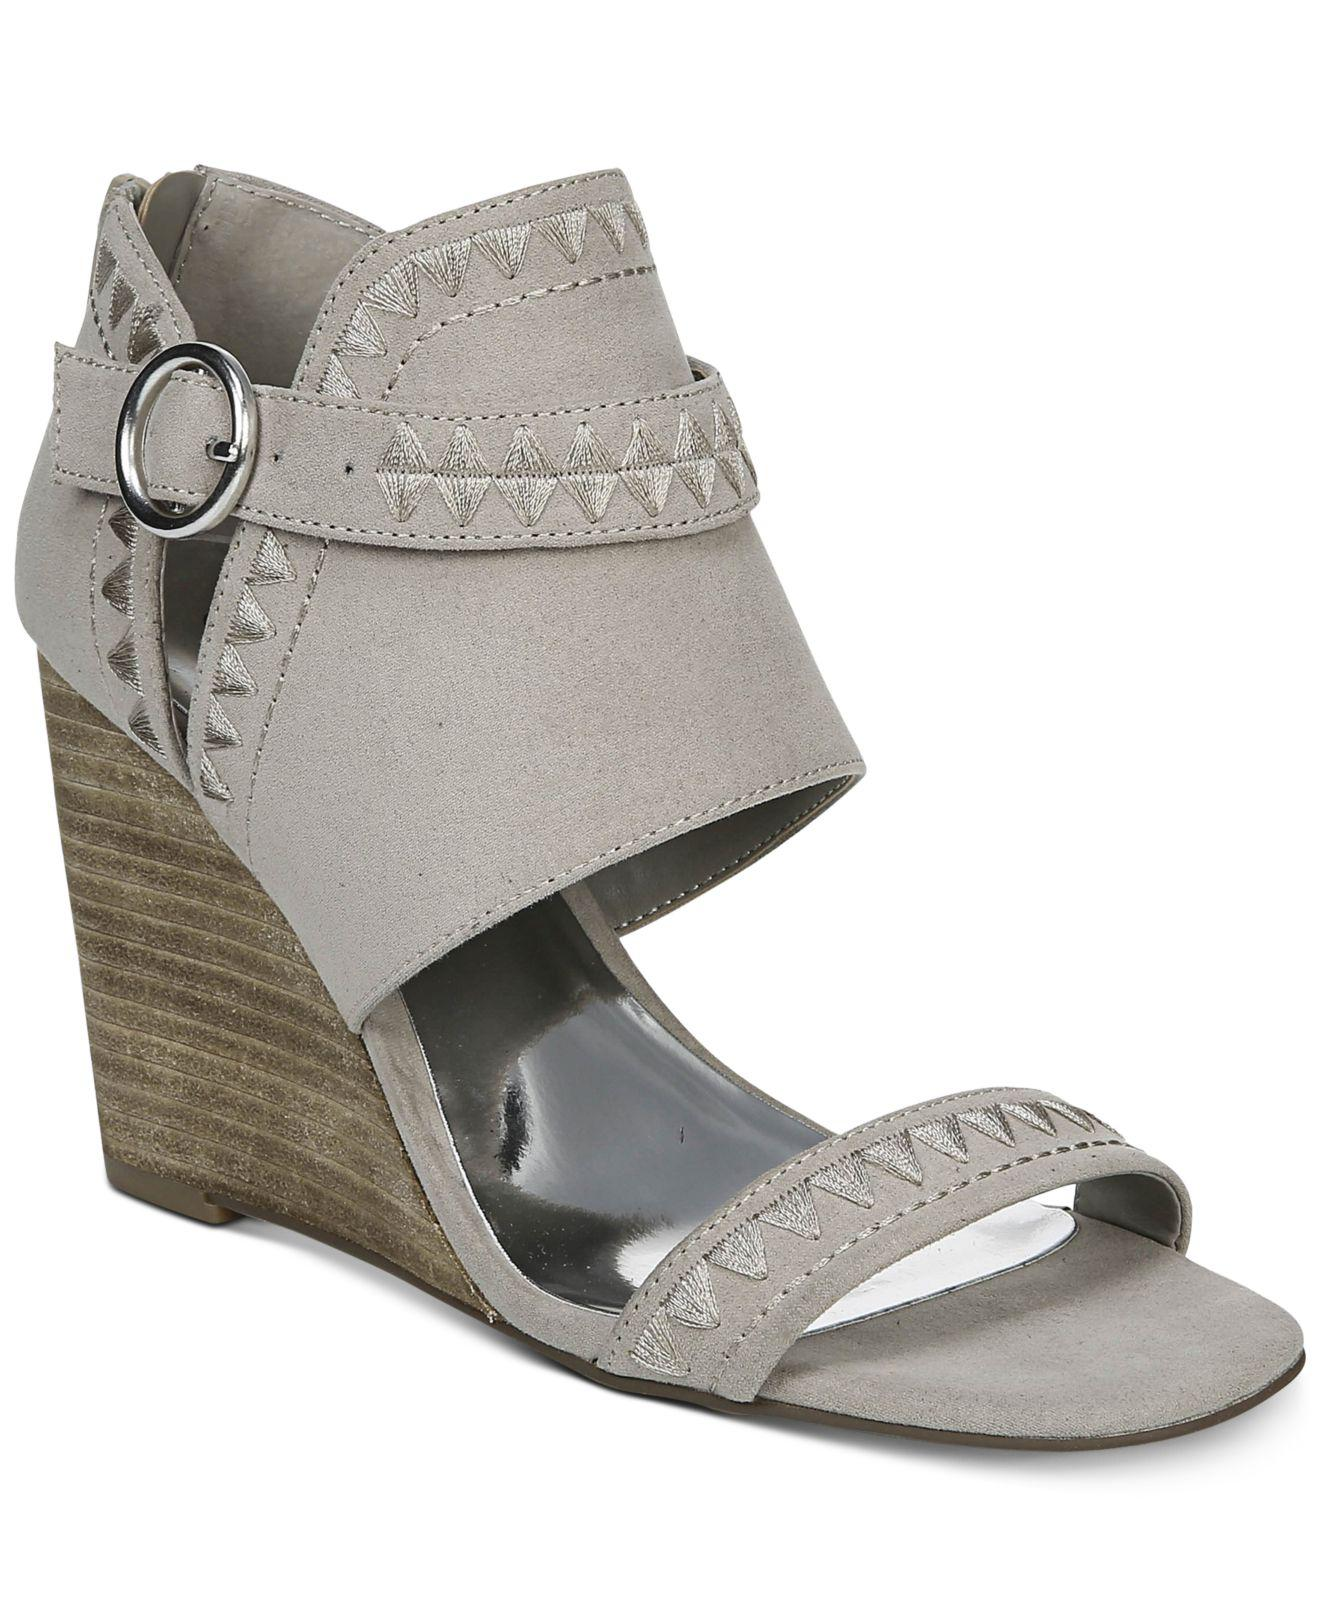 22038465932 Carlos By Carlos Santana. Women s Gadot Wedge Sandals